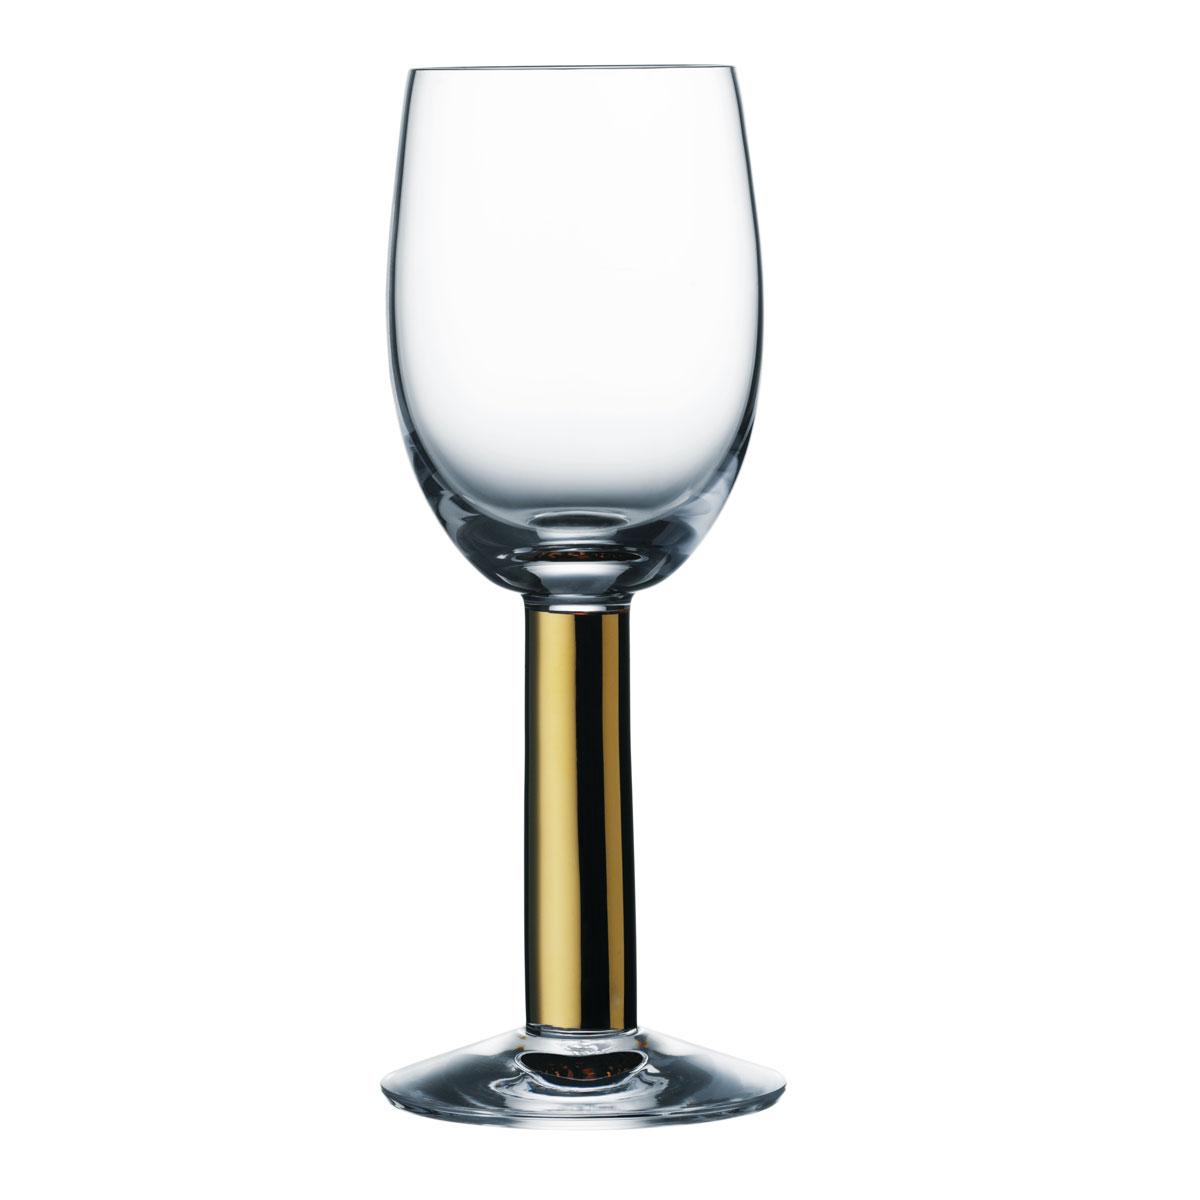 Orrefors Crystal Nobel Universal Glass, Single